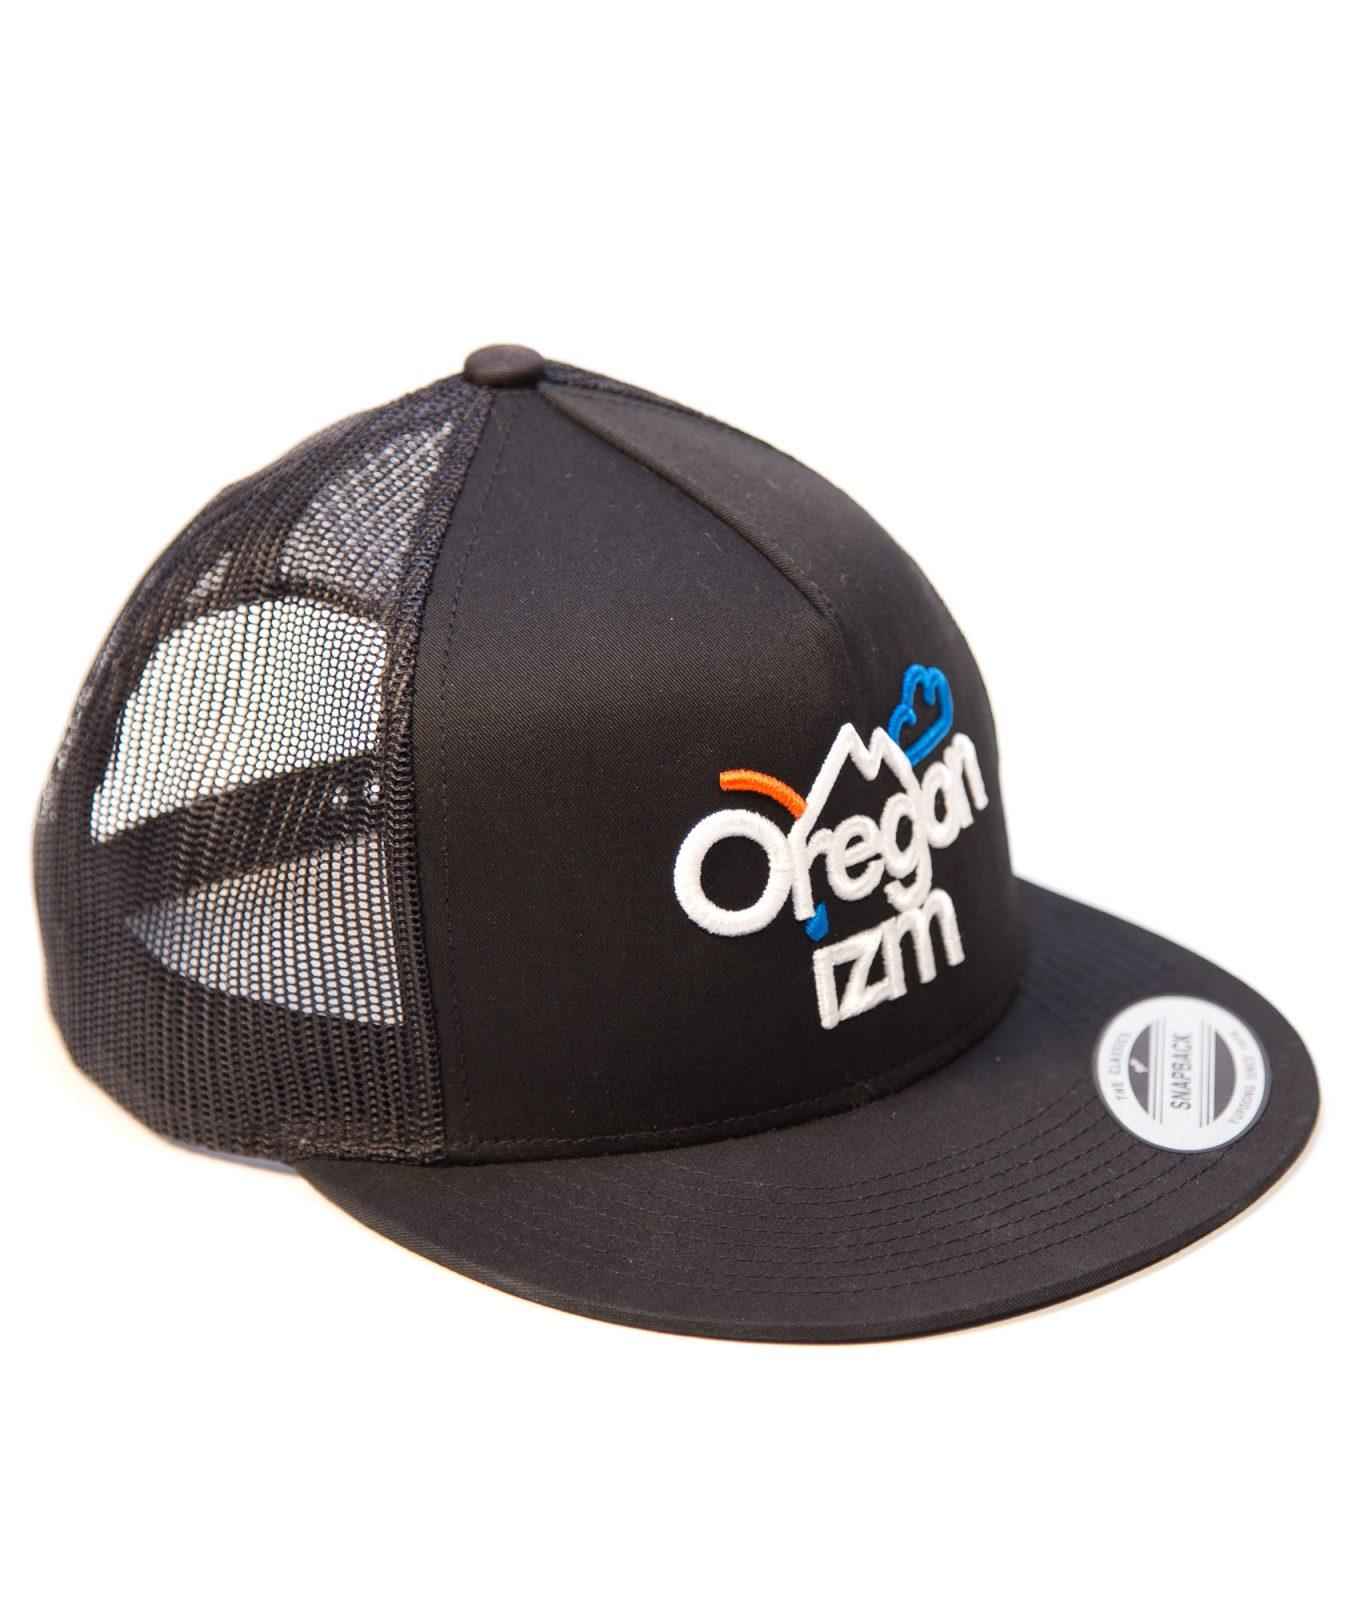 IZM-ProductImages-Hats-3D1